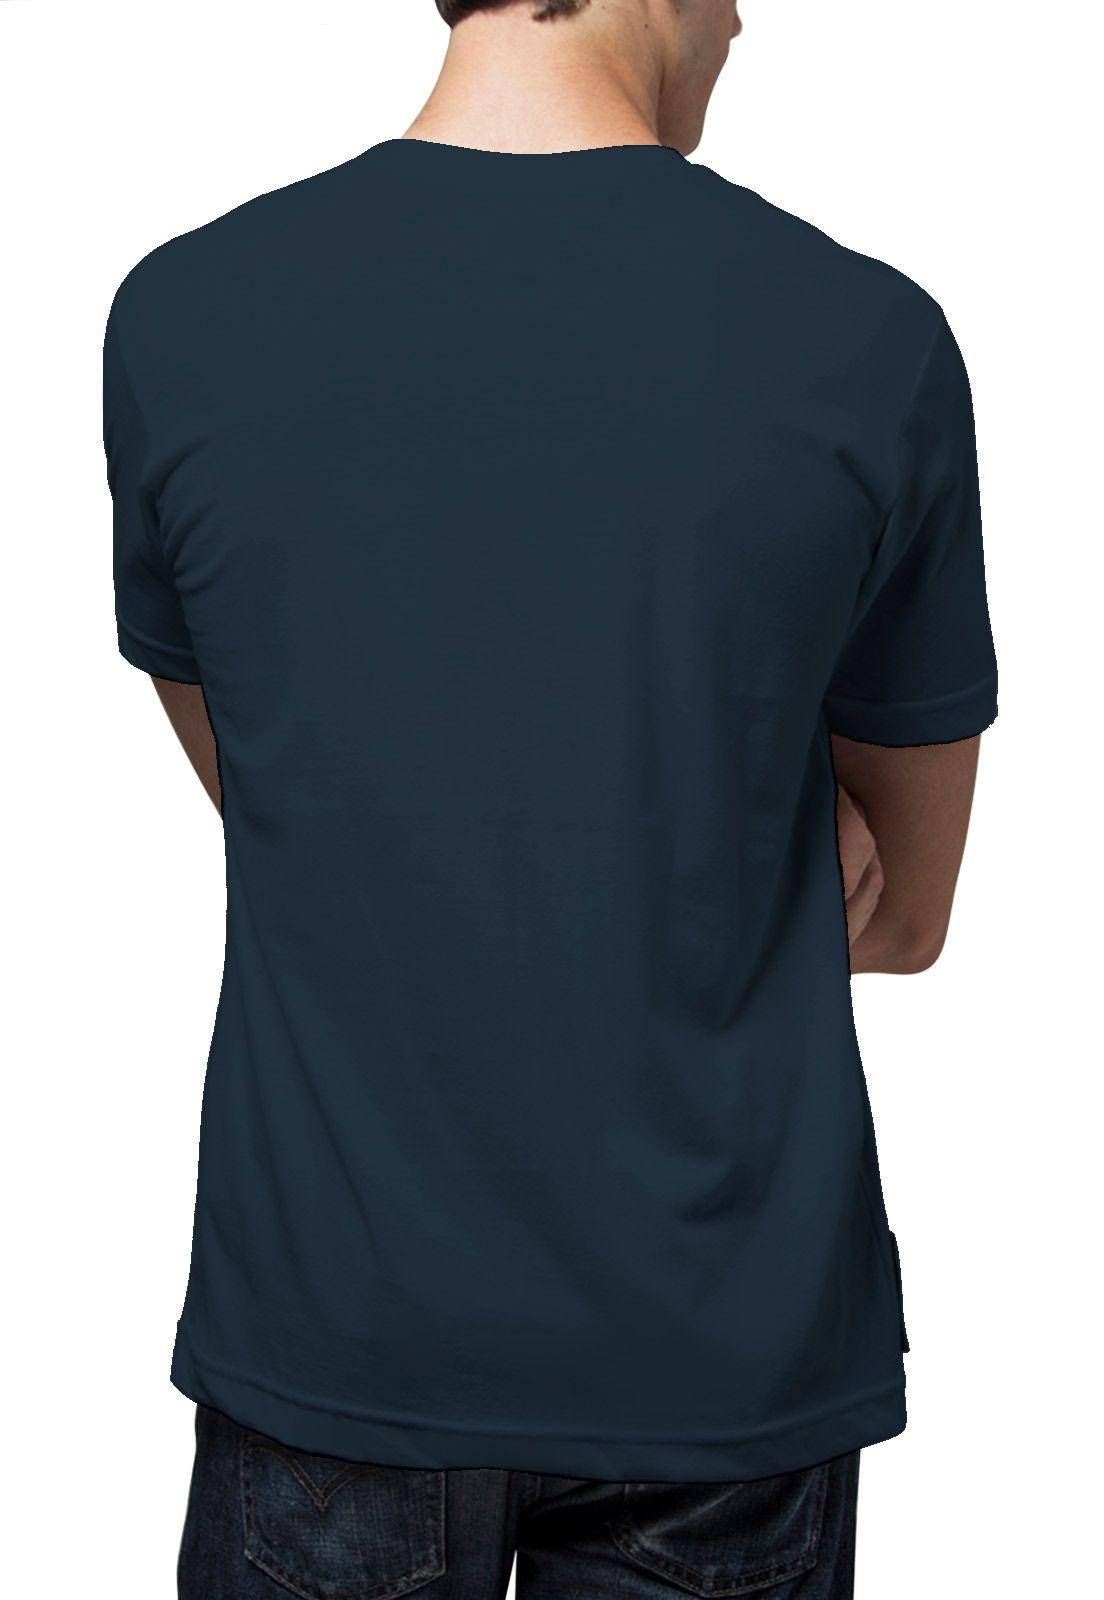 Camiseta Amazônia Lobo - Azul Escuro